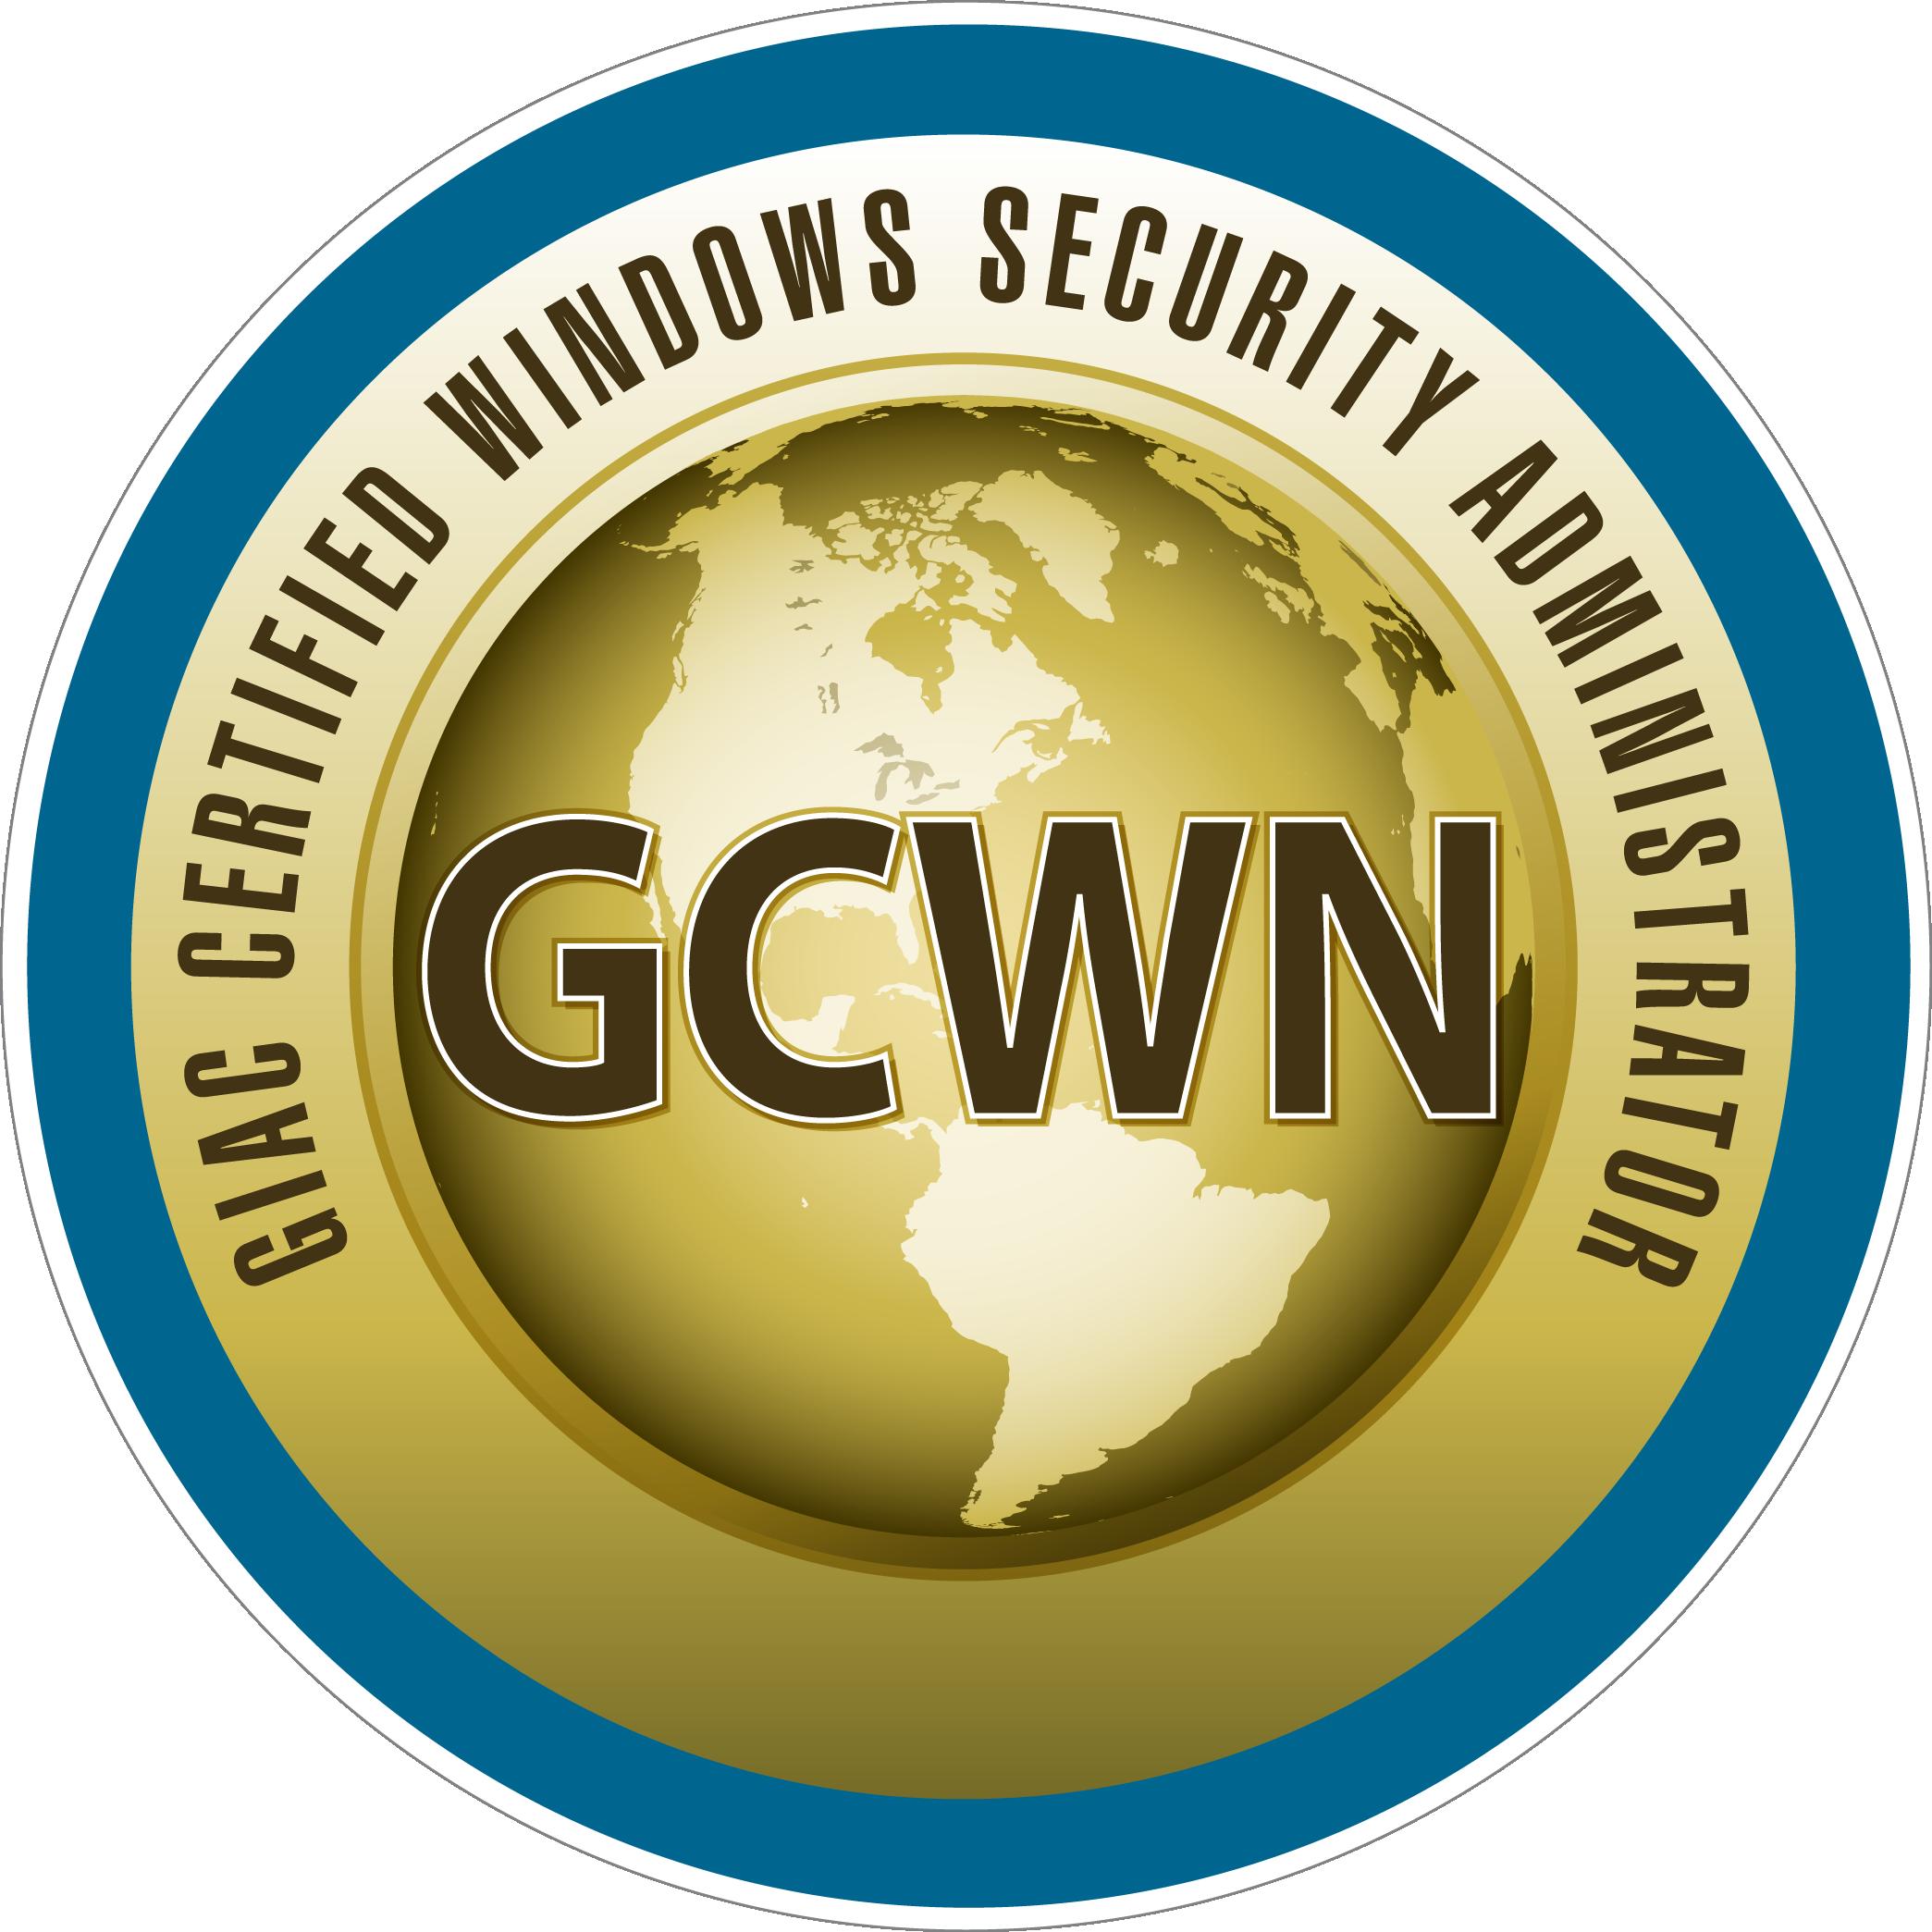 GIAC Certified Windows Security Administrator (GCWN) icon